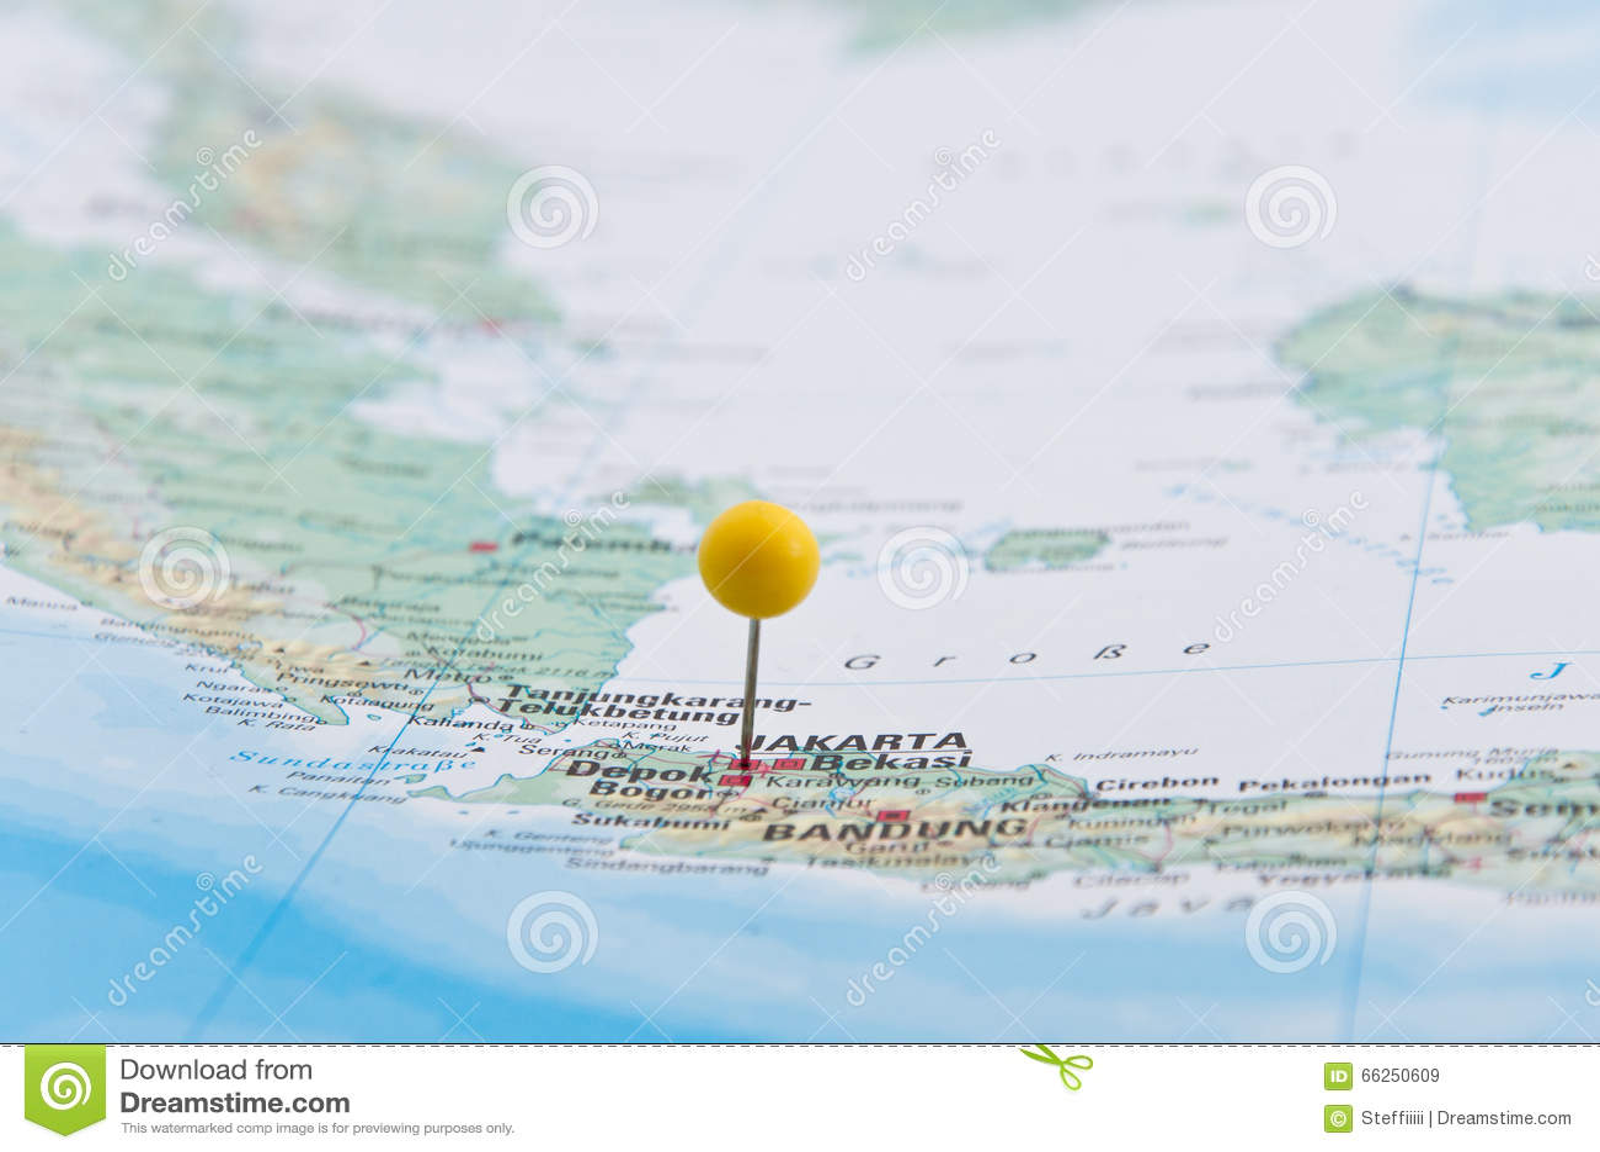 Jakarta, Java, Indonesia, Yellow Pin, Close-Up of Map.